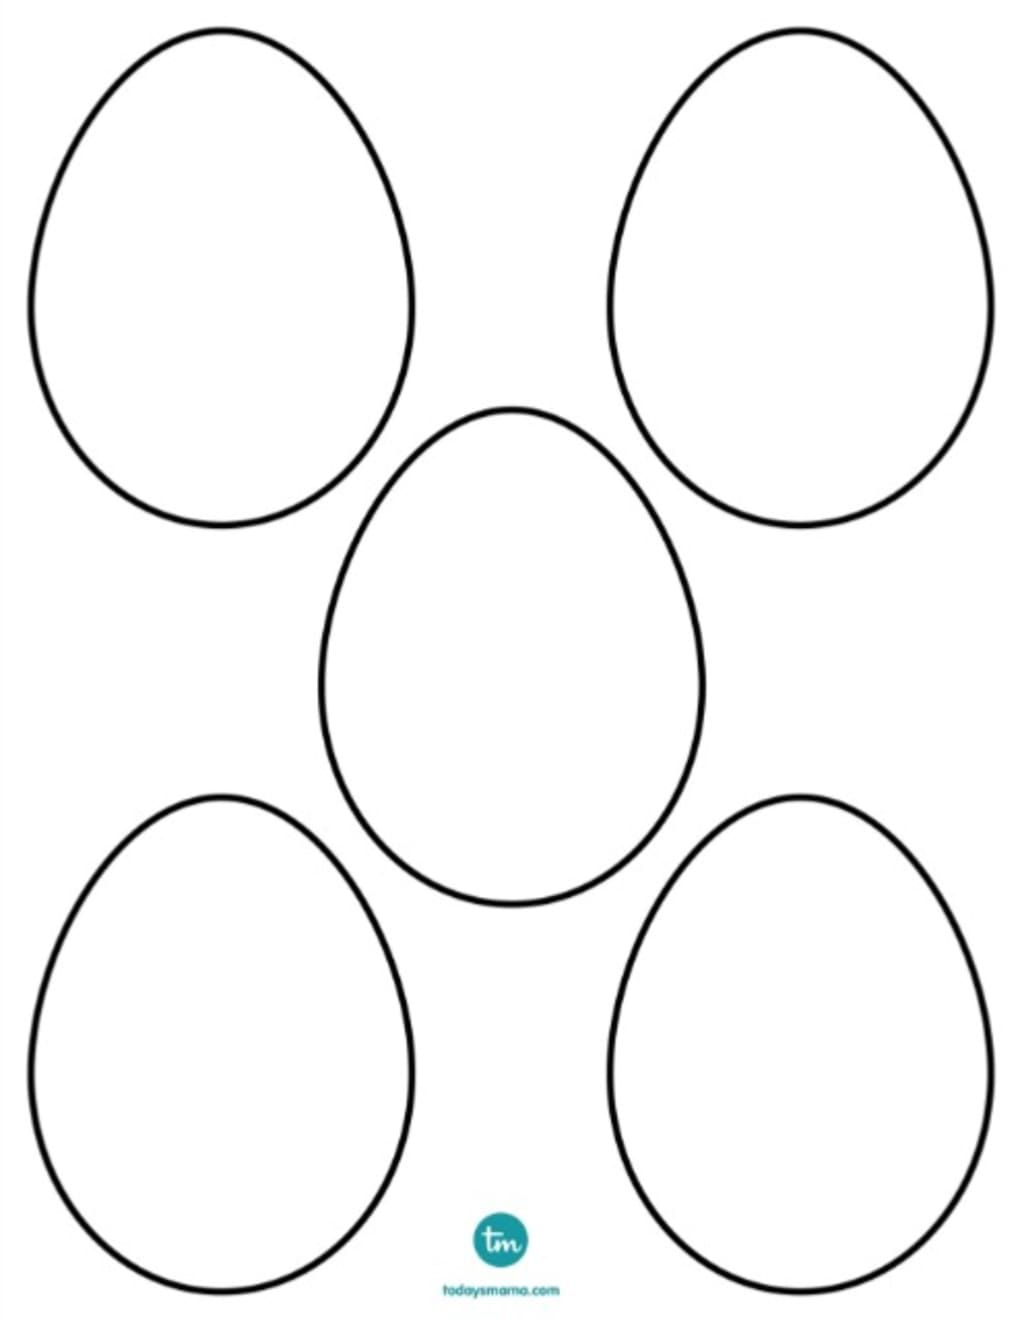 Zendoodle Easter Egg Coloring Pages Easter Egg Coloring Pages Coloring Easter Eggs Easter Egg Template